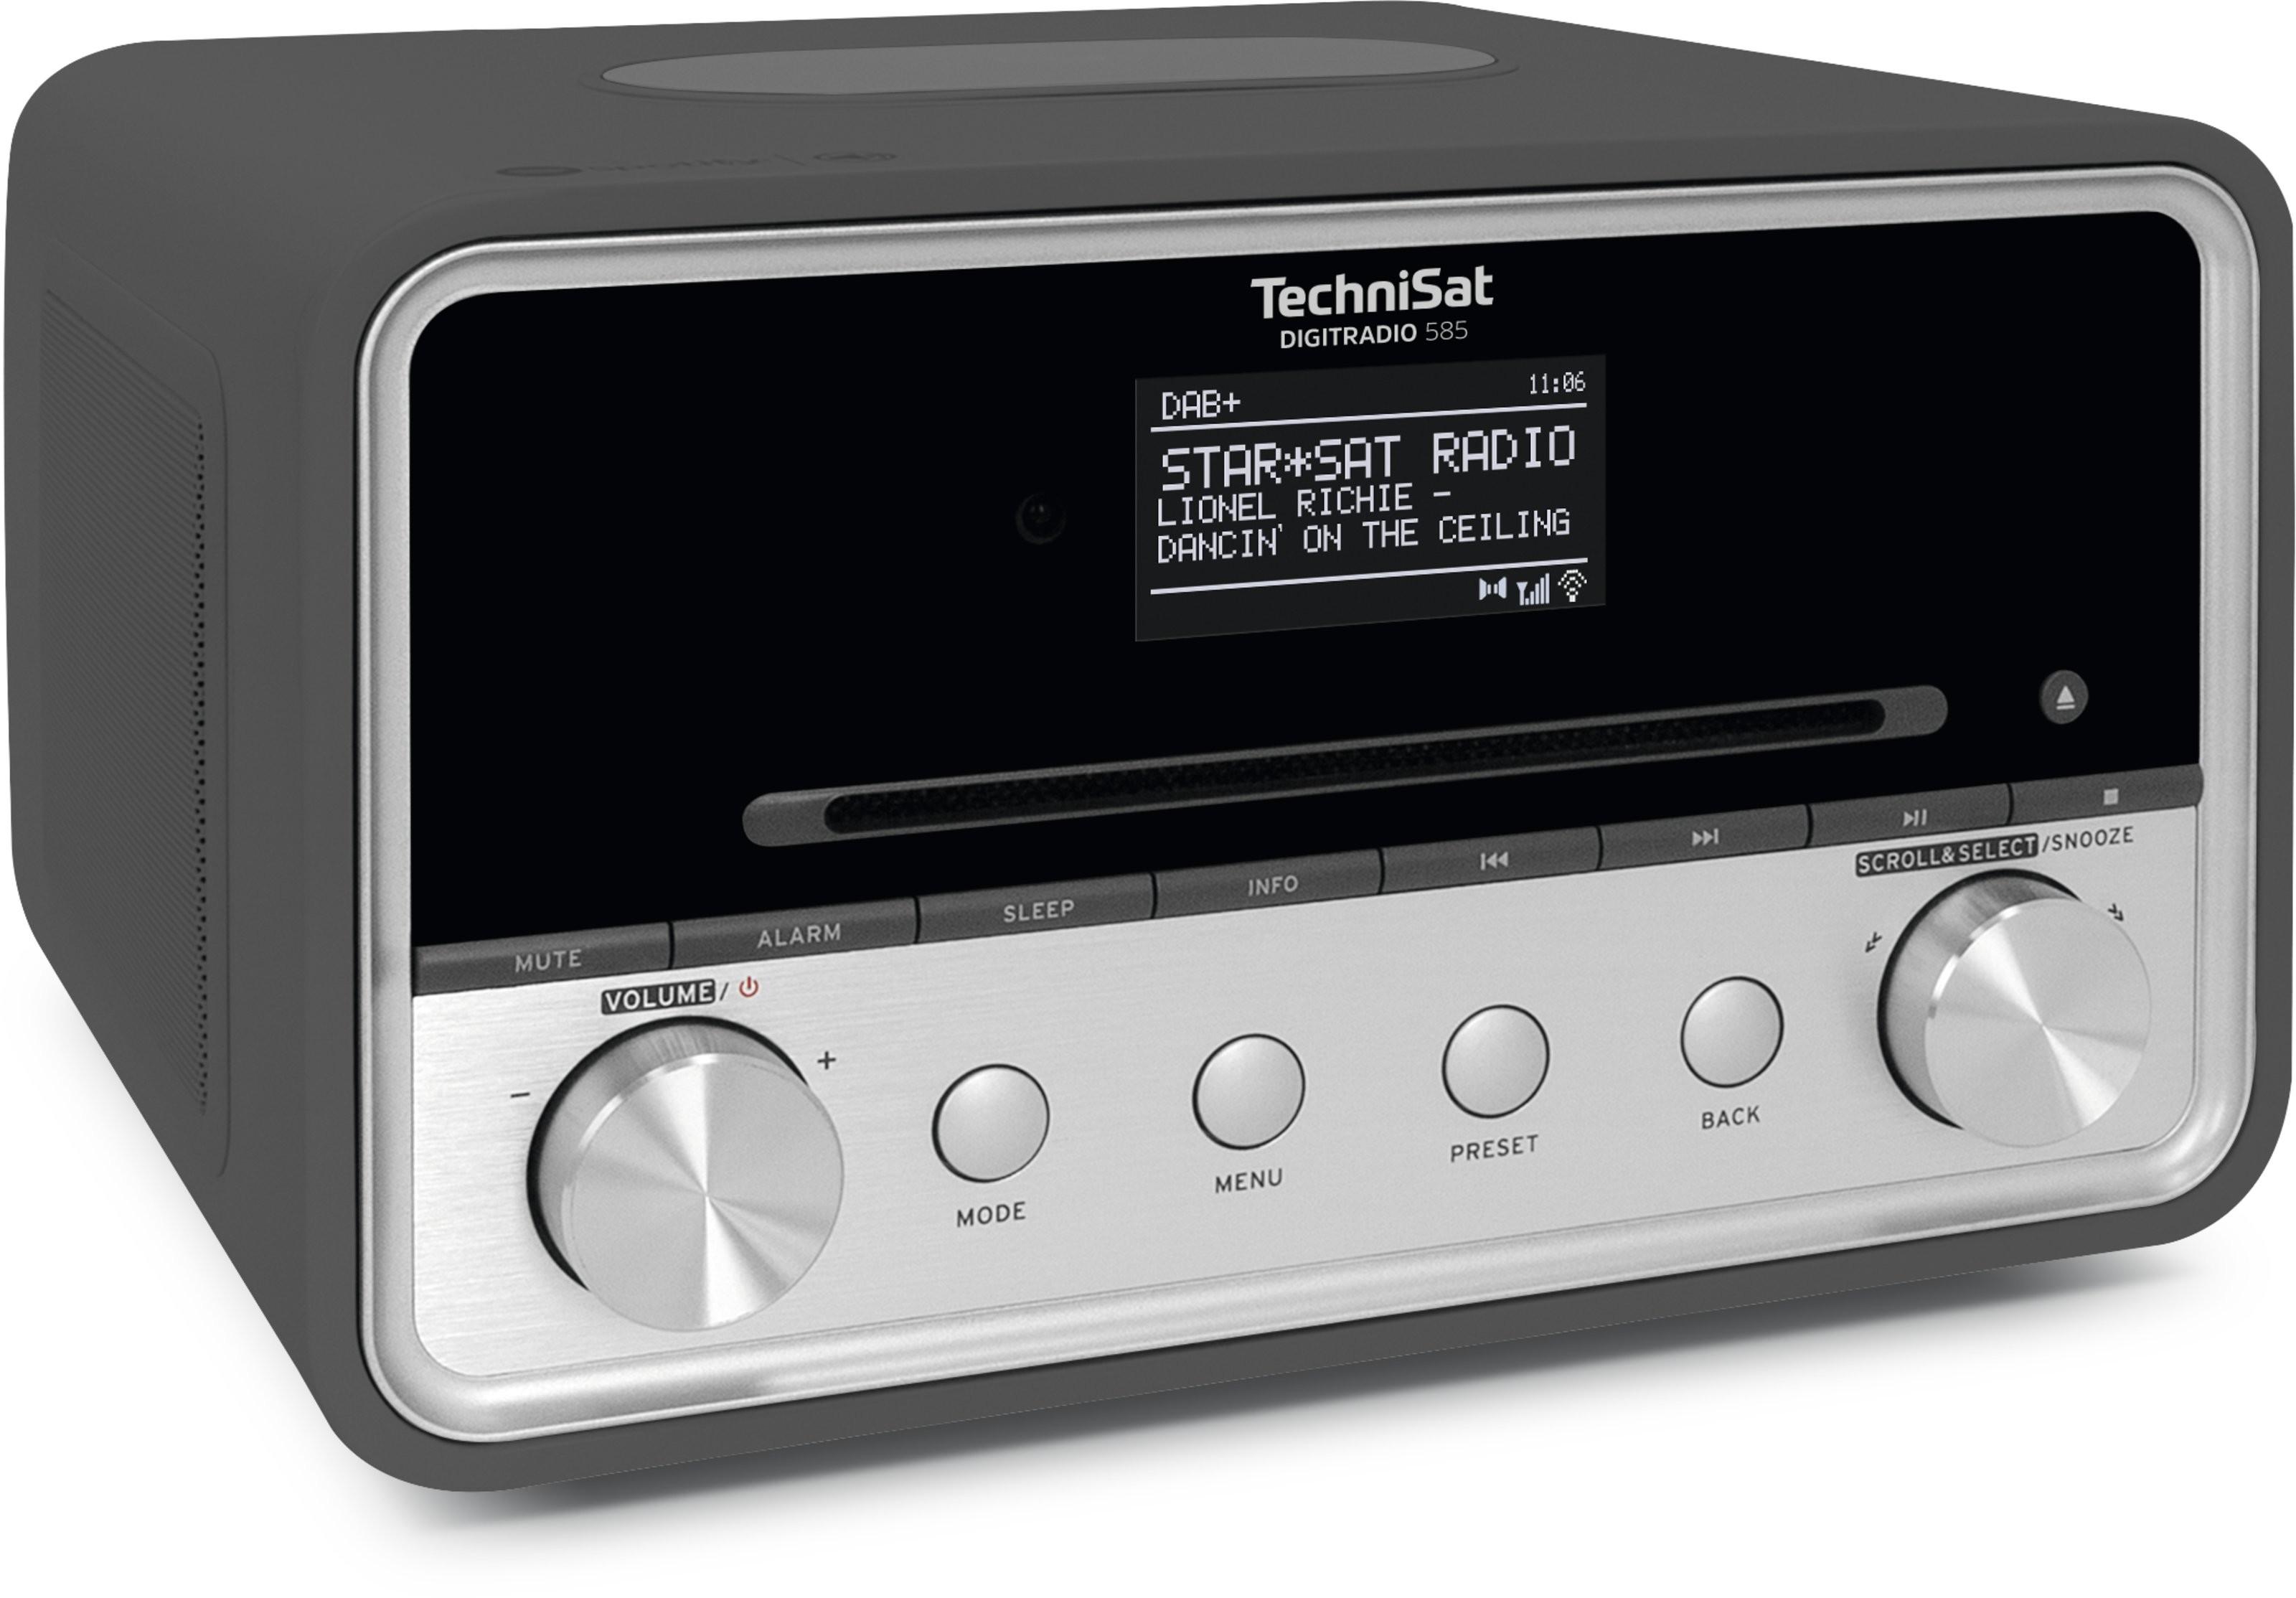 TechniSat DIGITRADIO 585 ANTRACYT (0001/3950)